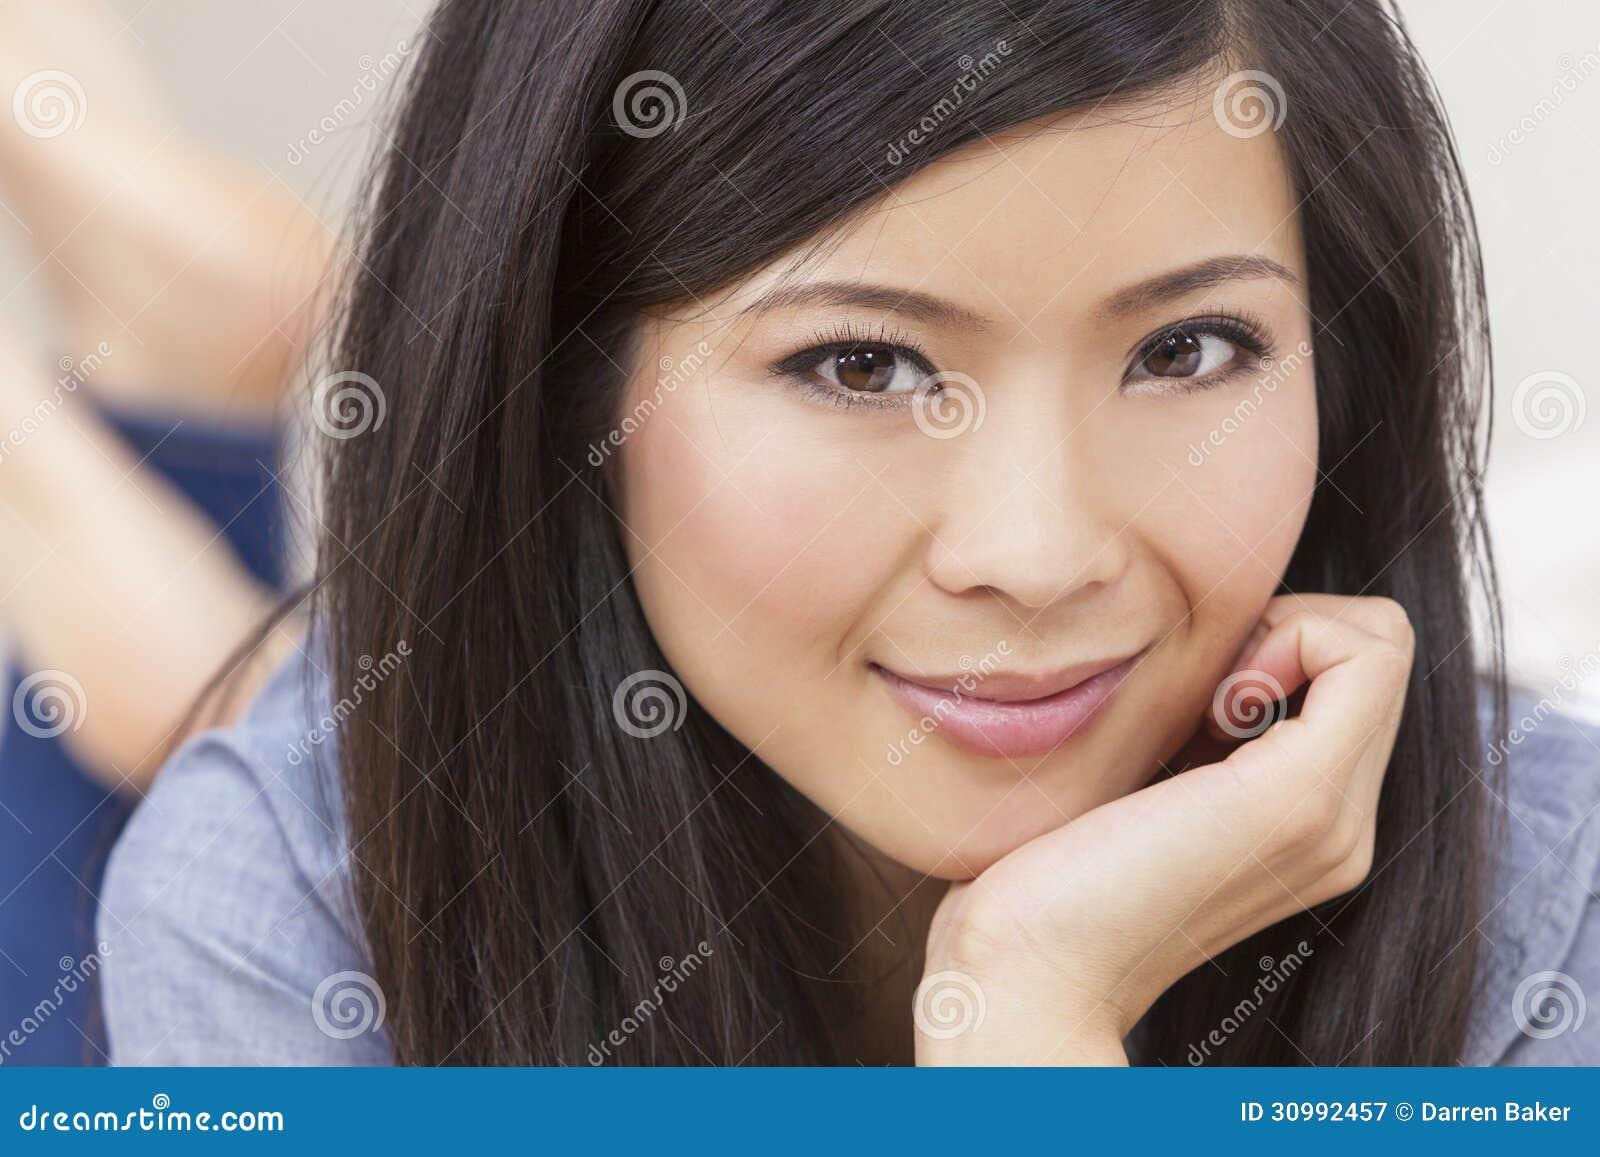 belle jeune femme chinoise asiatique image stock image du fille brun 30992457. Black Bedroom Furniture Sets. Home Design Ideas